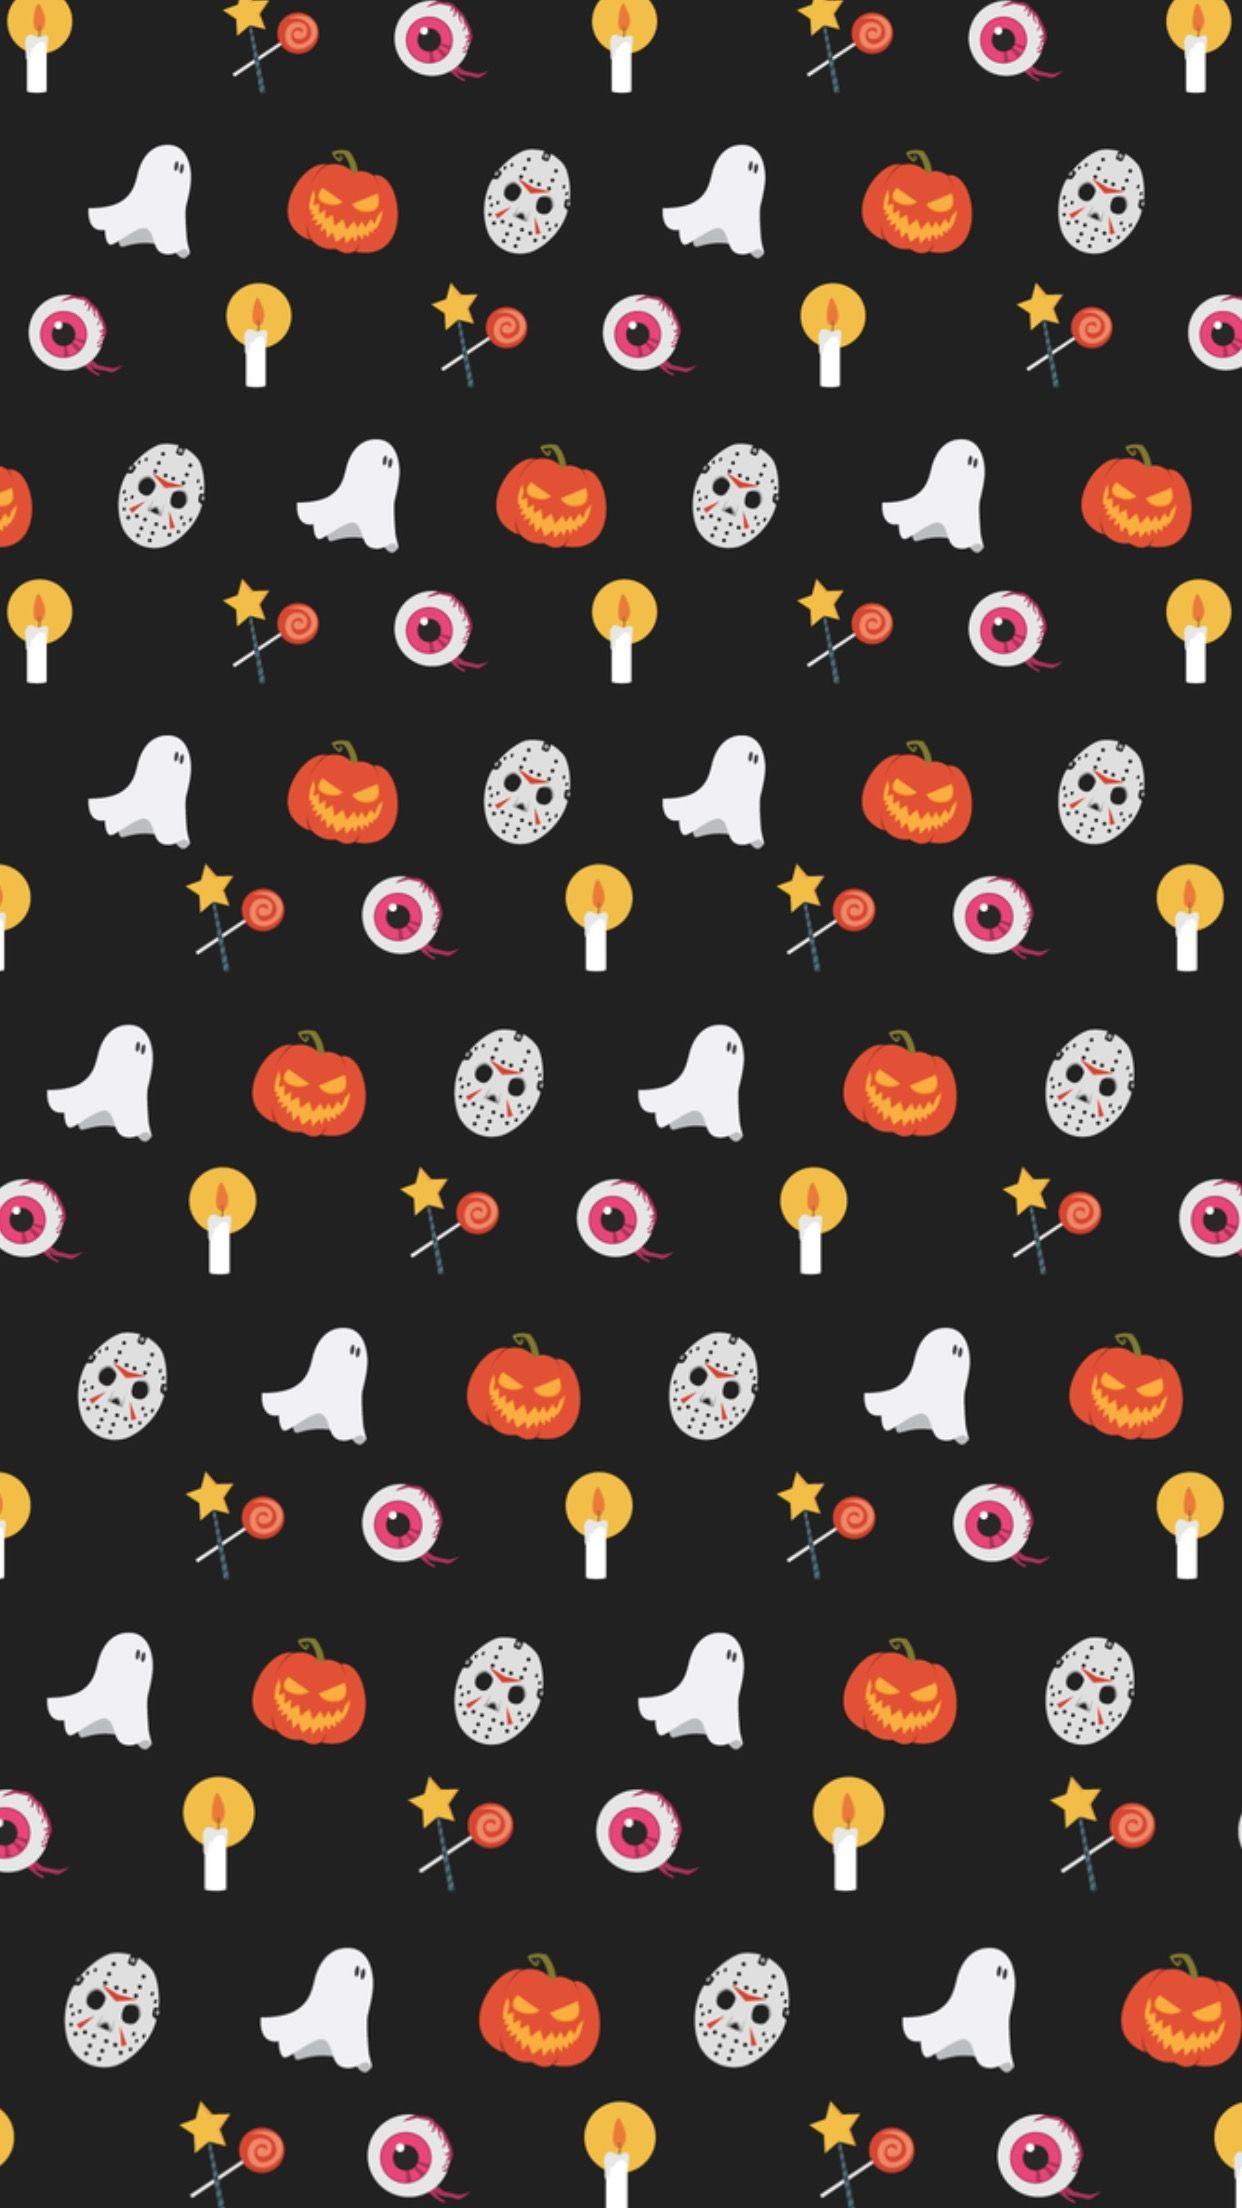 Pin By Aleena Bloom On Halloween Fall Halloween Wallpaper Halloween Wallpaper Iphone Halloween Backgrounds